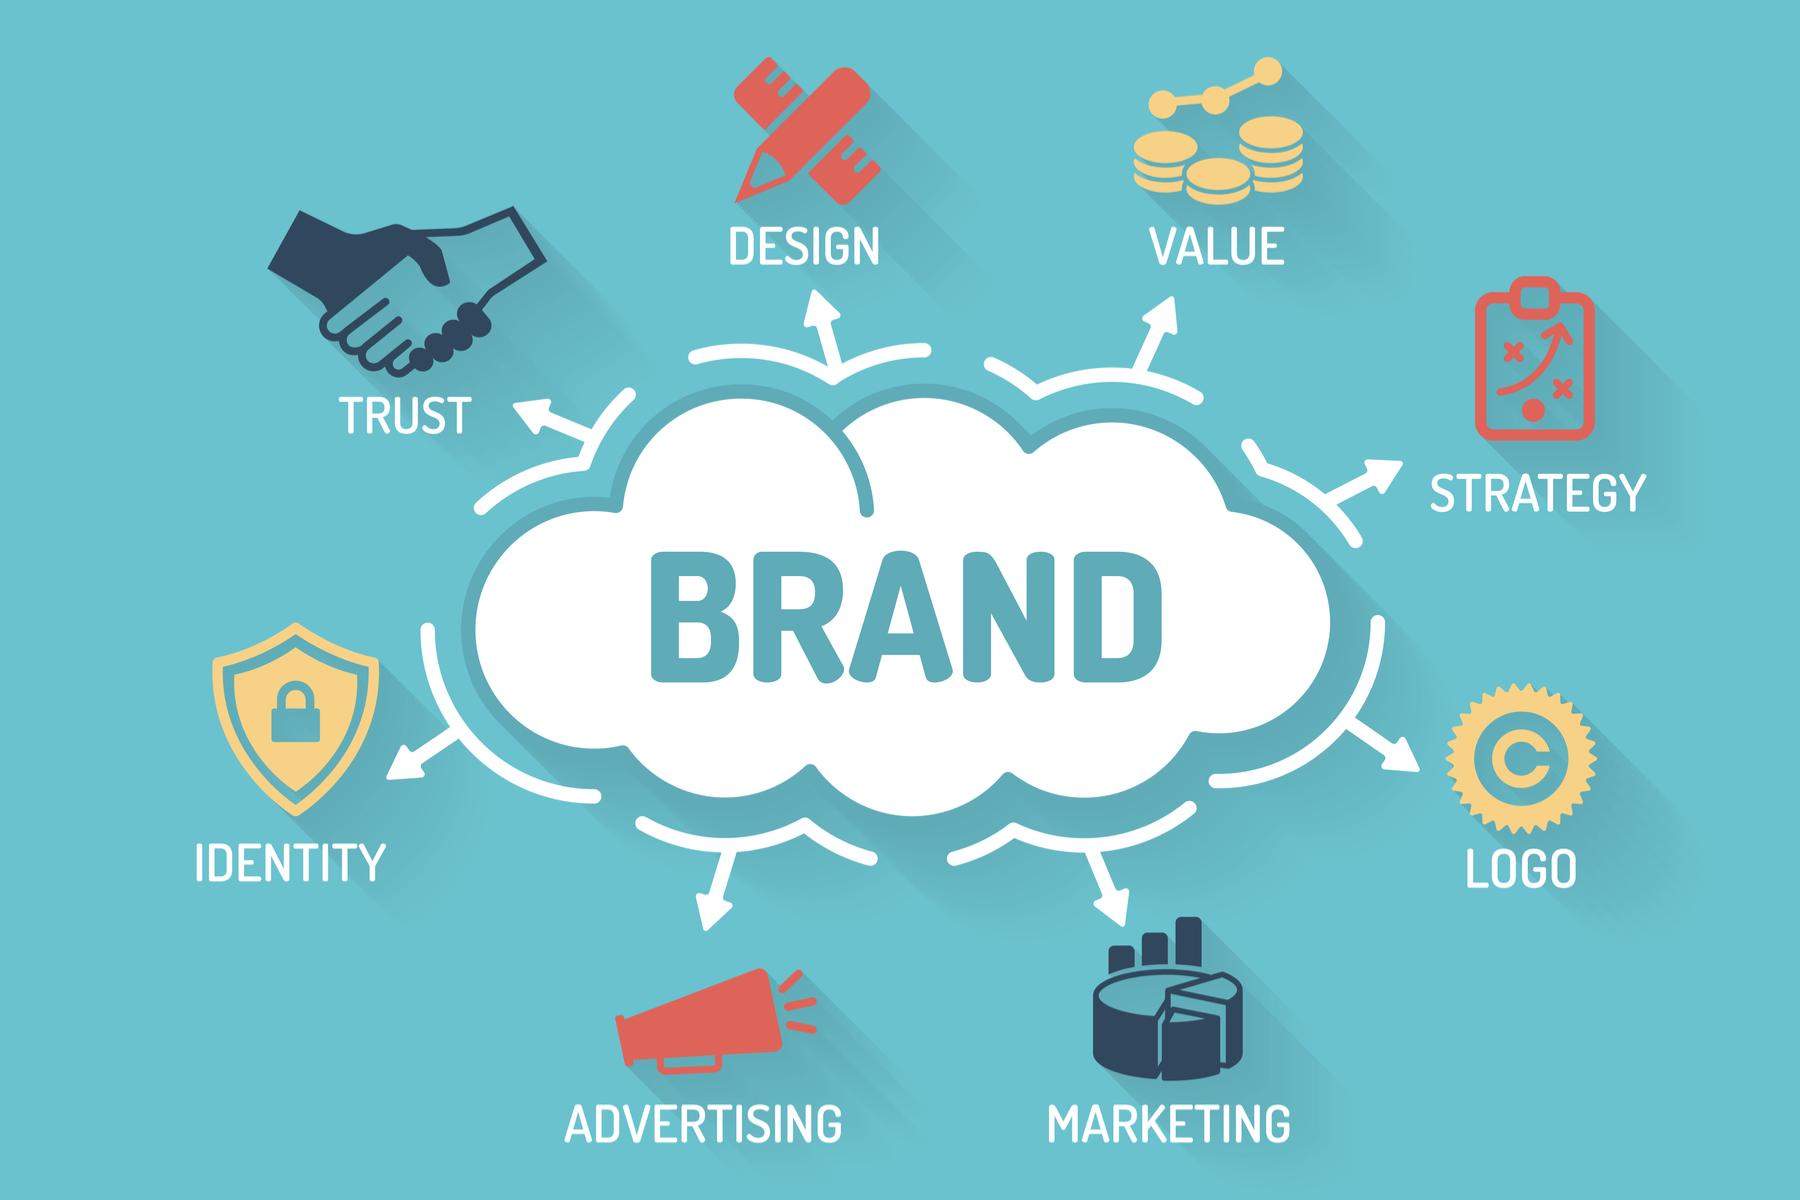 Brand_Trust_Journey